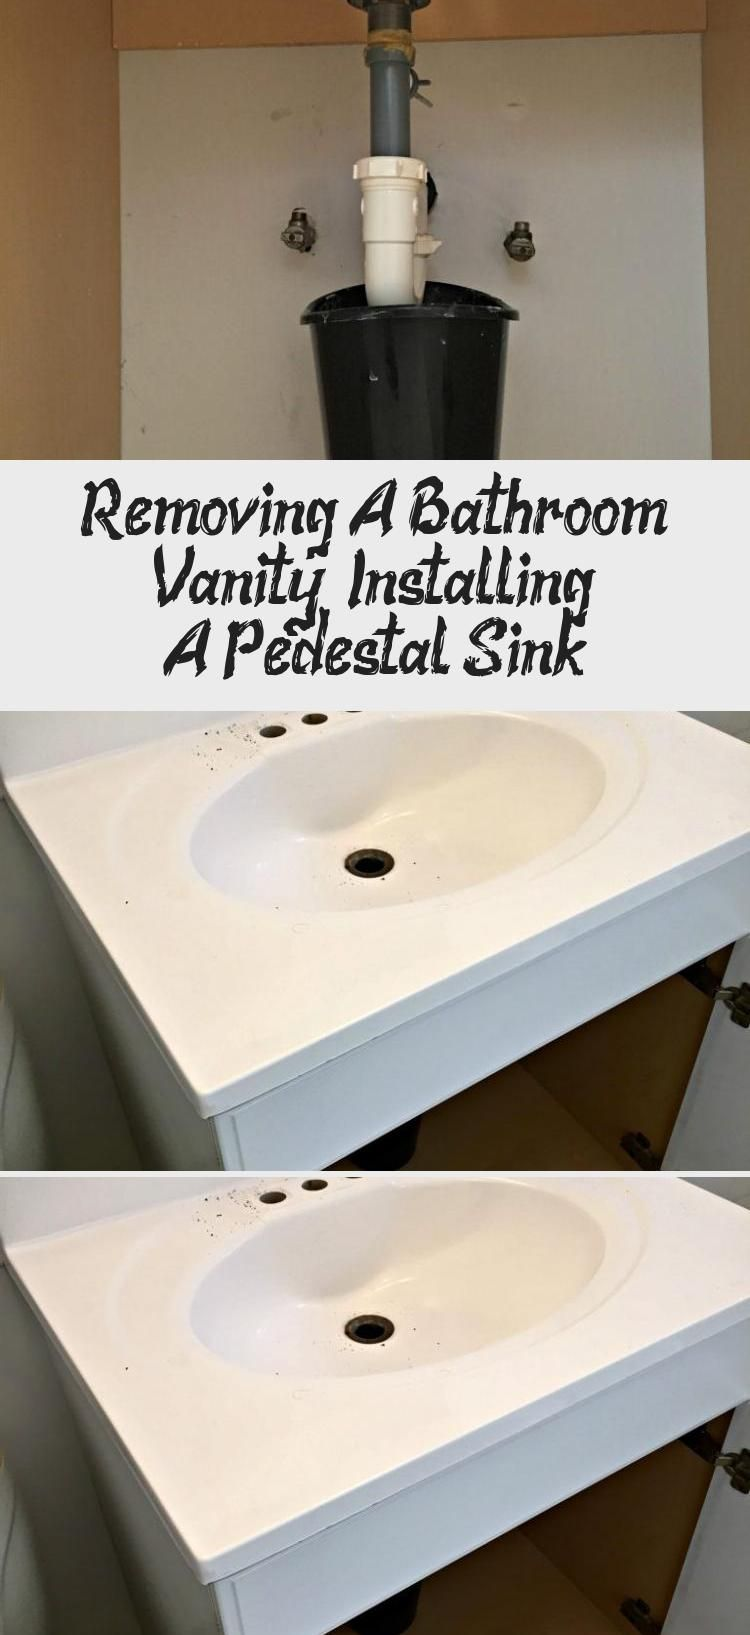 How To Remove A Bathroom Sink Vanity In 7 Simple Steps